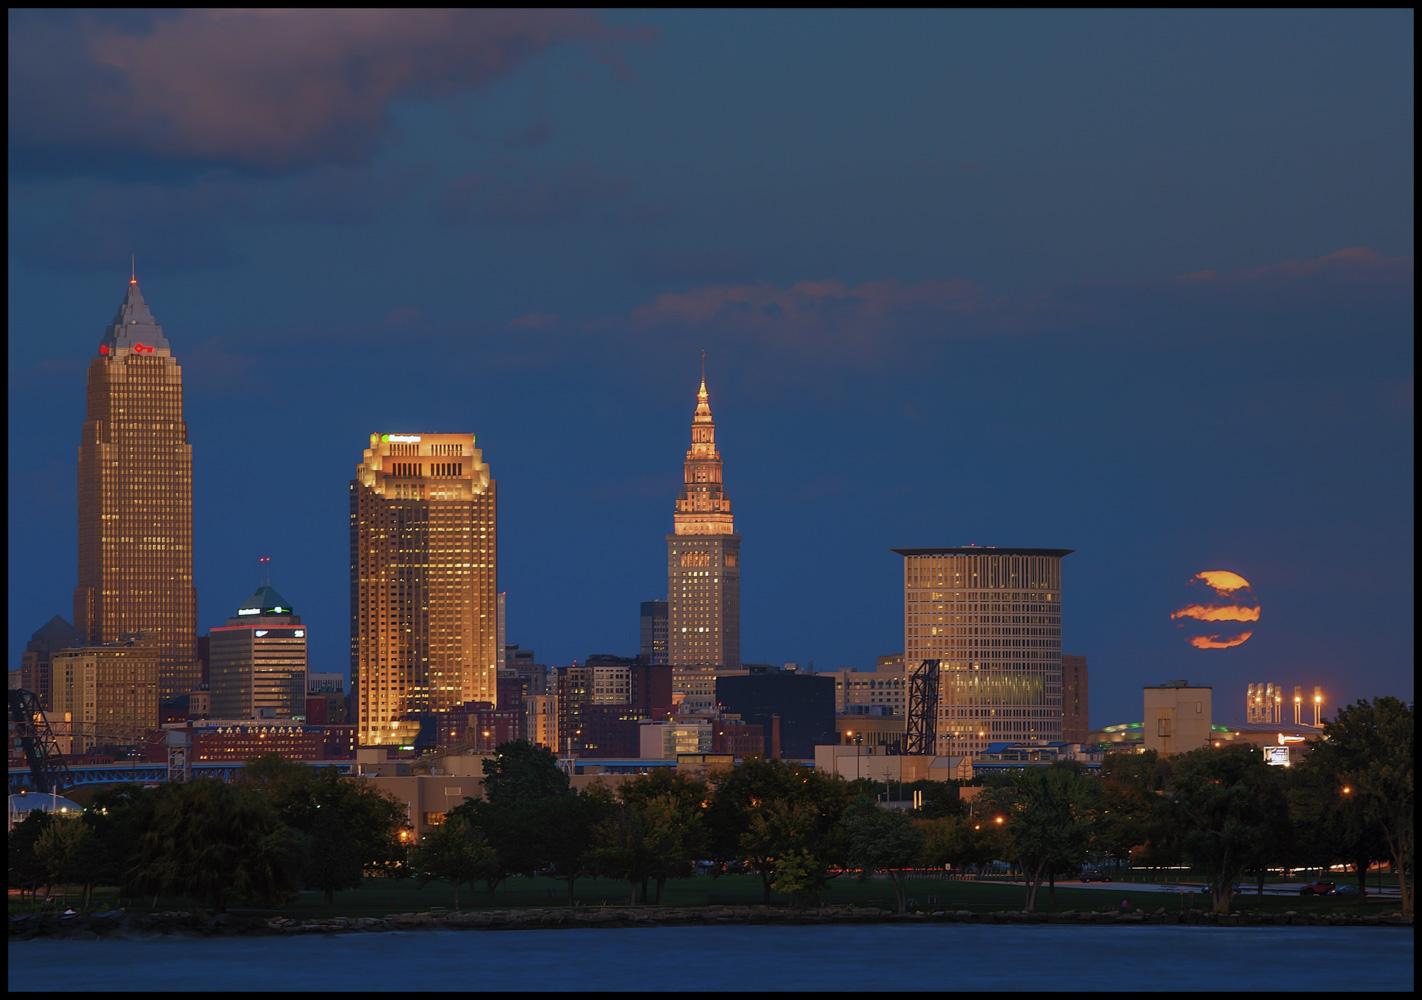 Moonrise Over Cleveland, USA